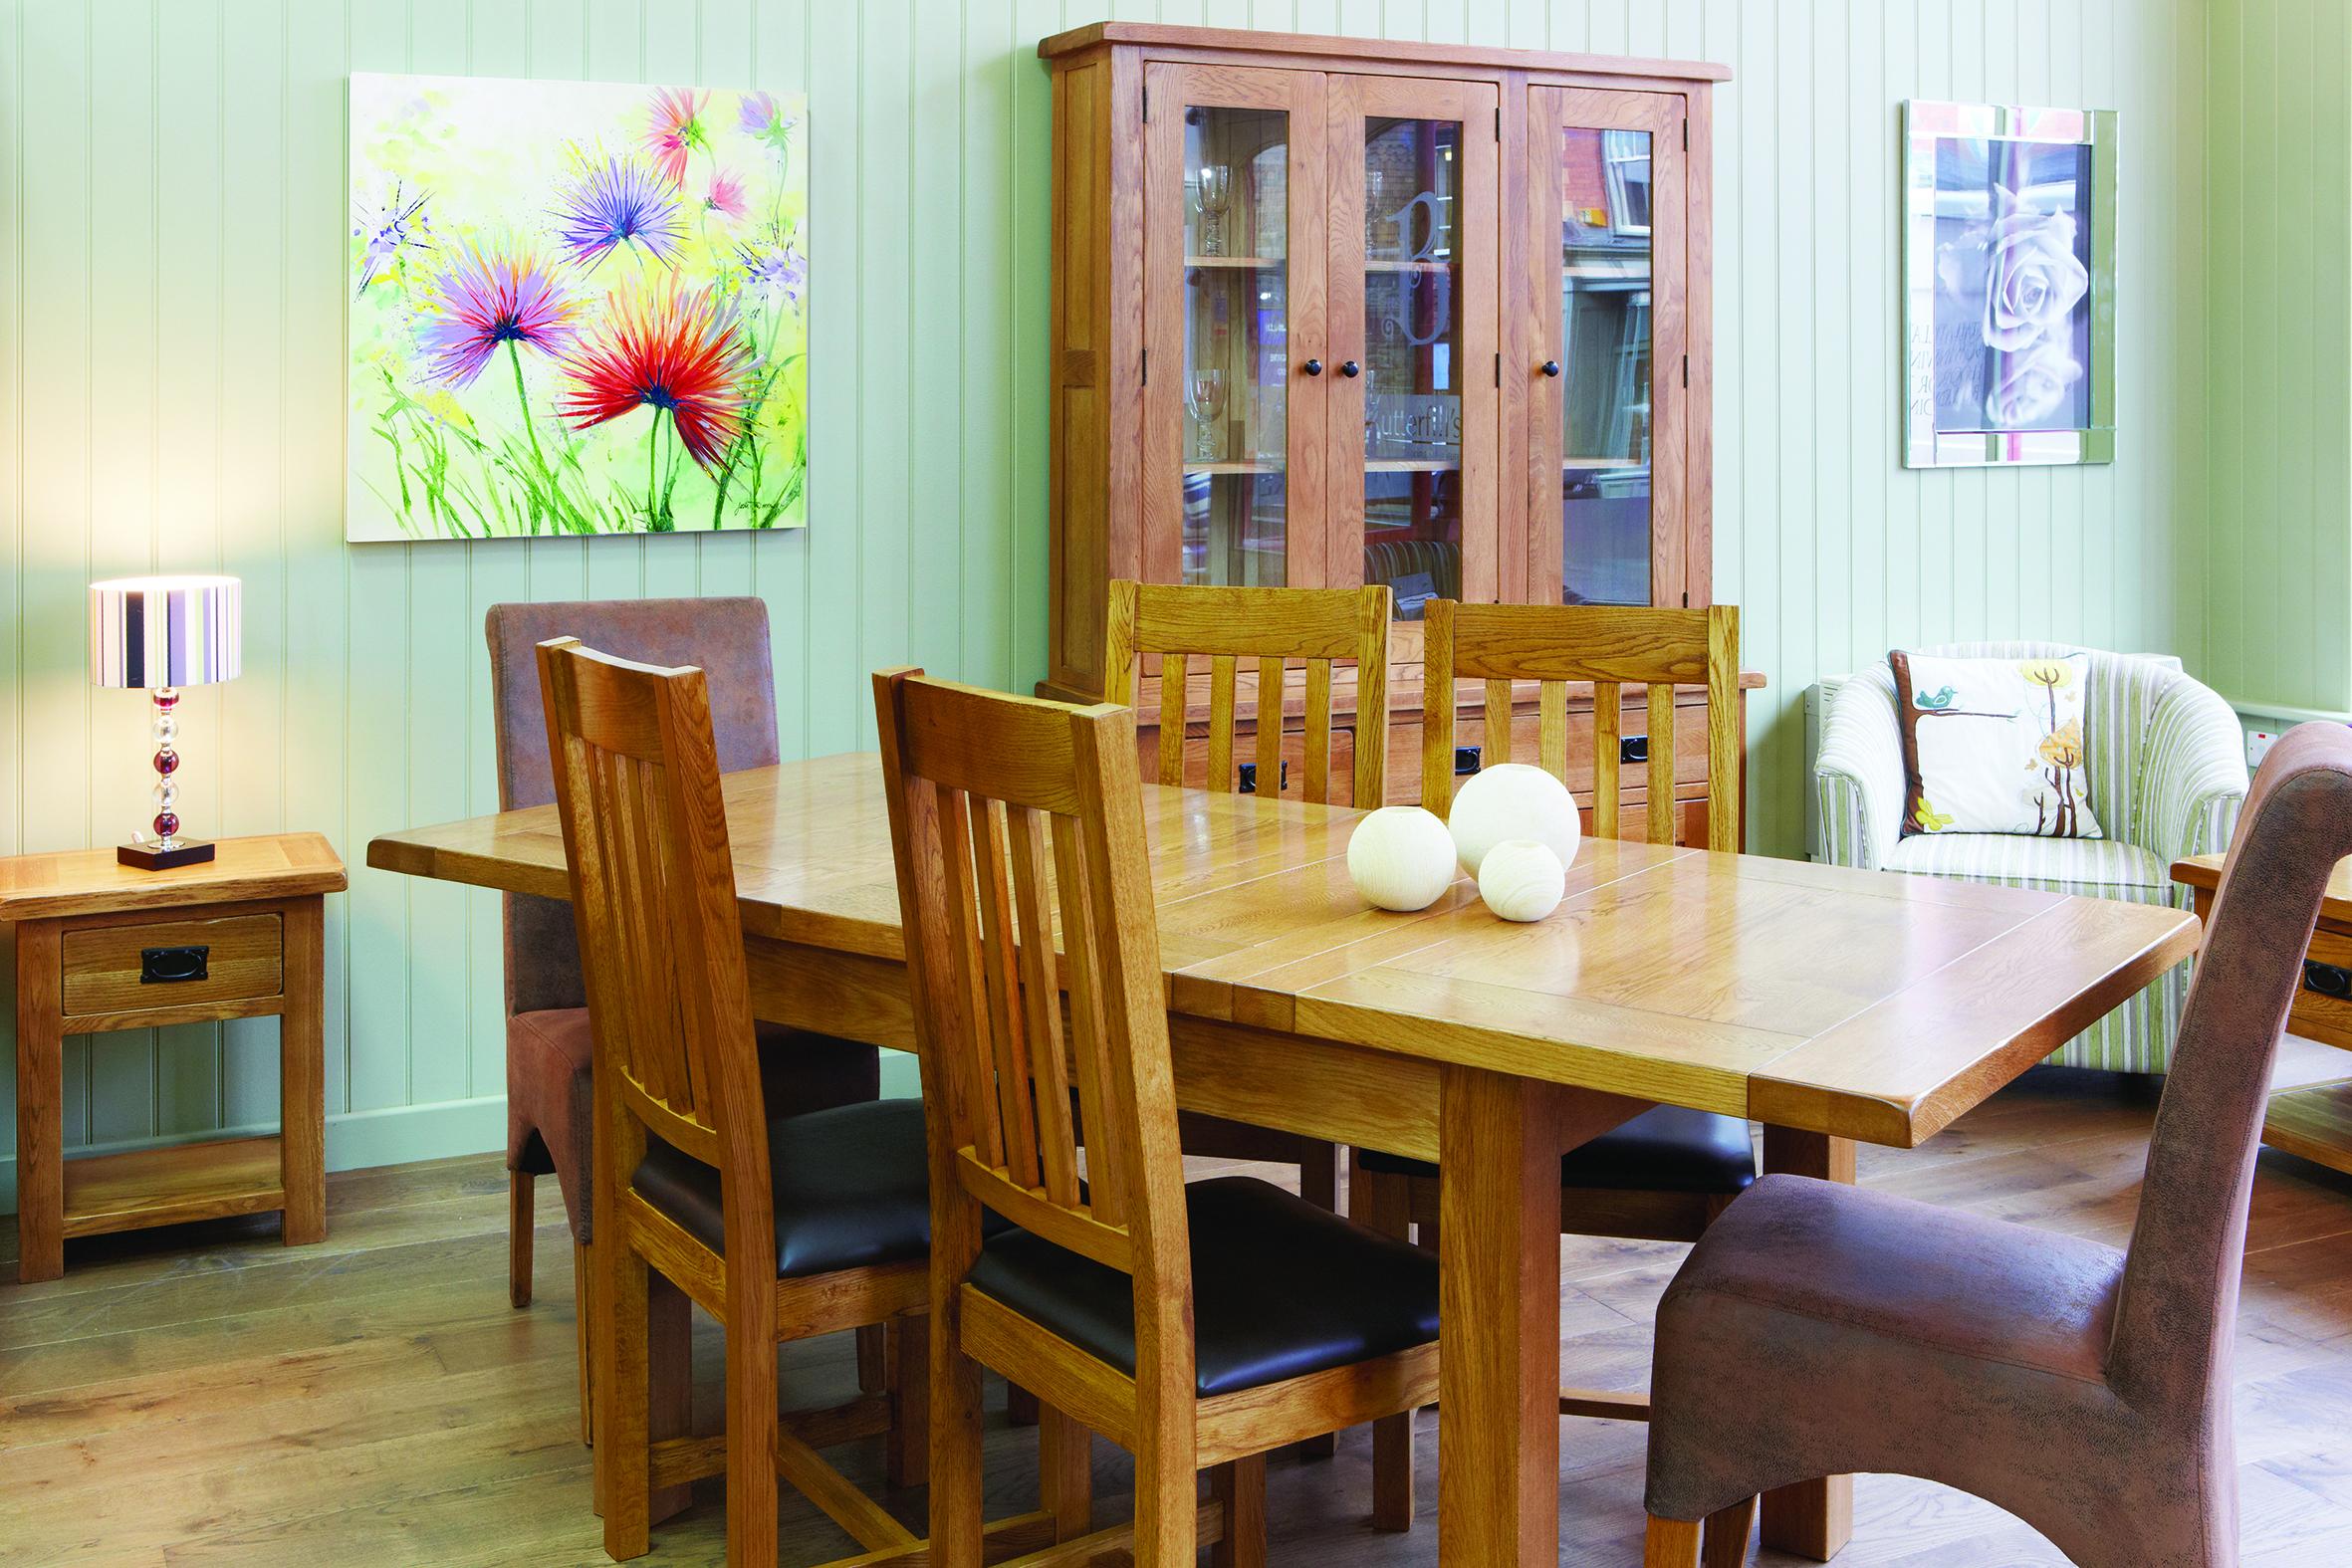 Butterfills furniture store Llandrindod Wells